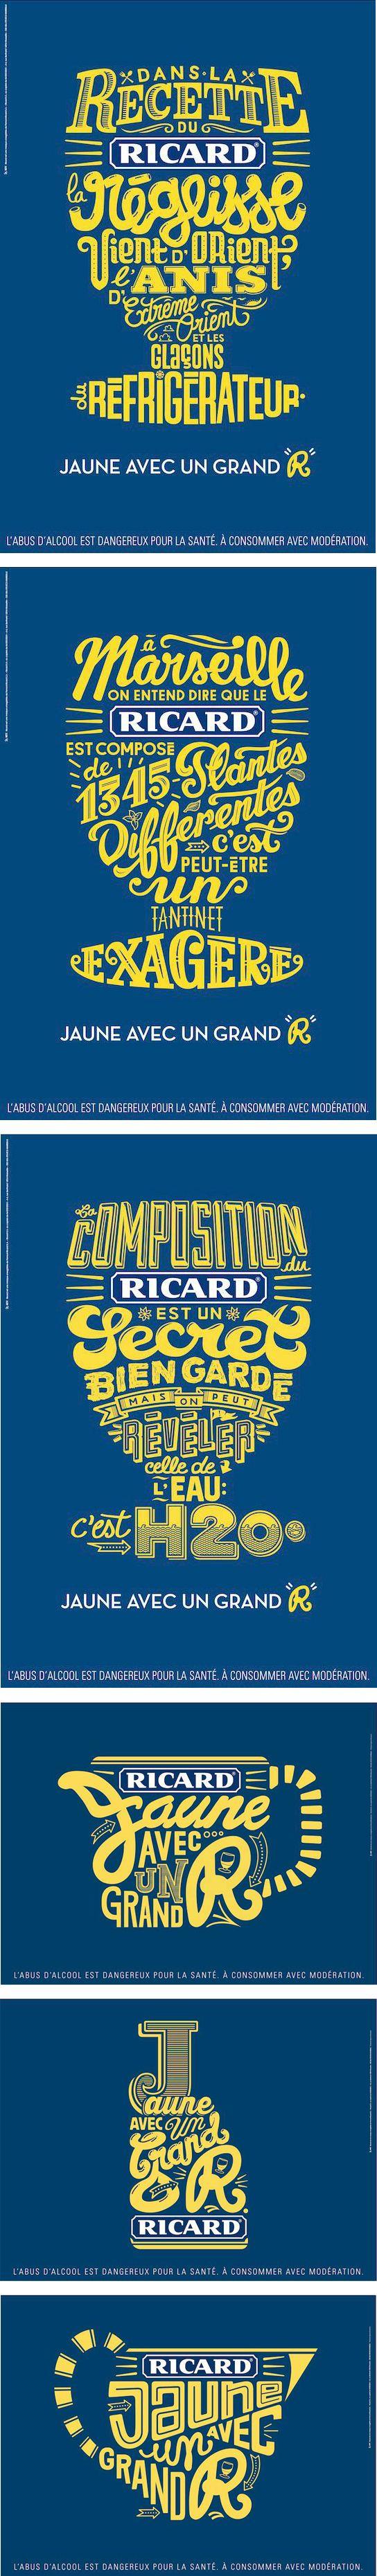 Ricard by BETC